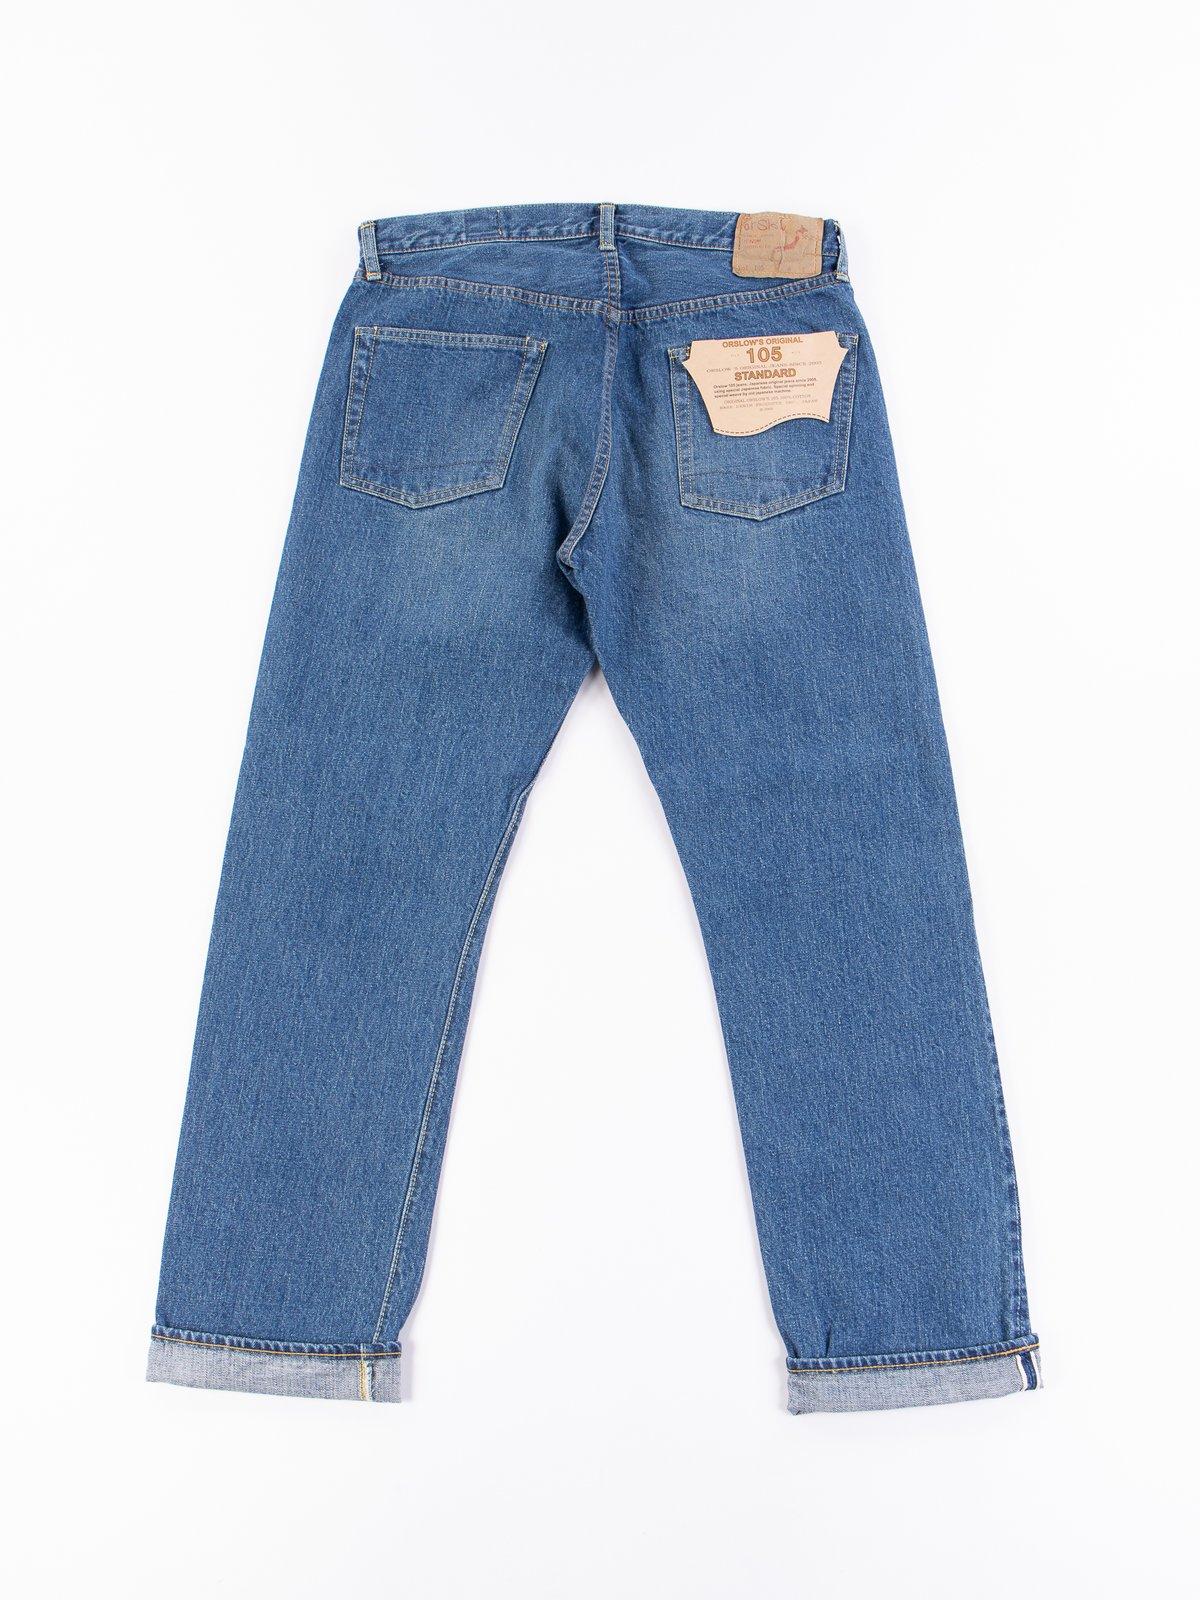 2 Year Wash 105 Standard 5 Pocket Jean - Image 7